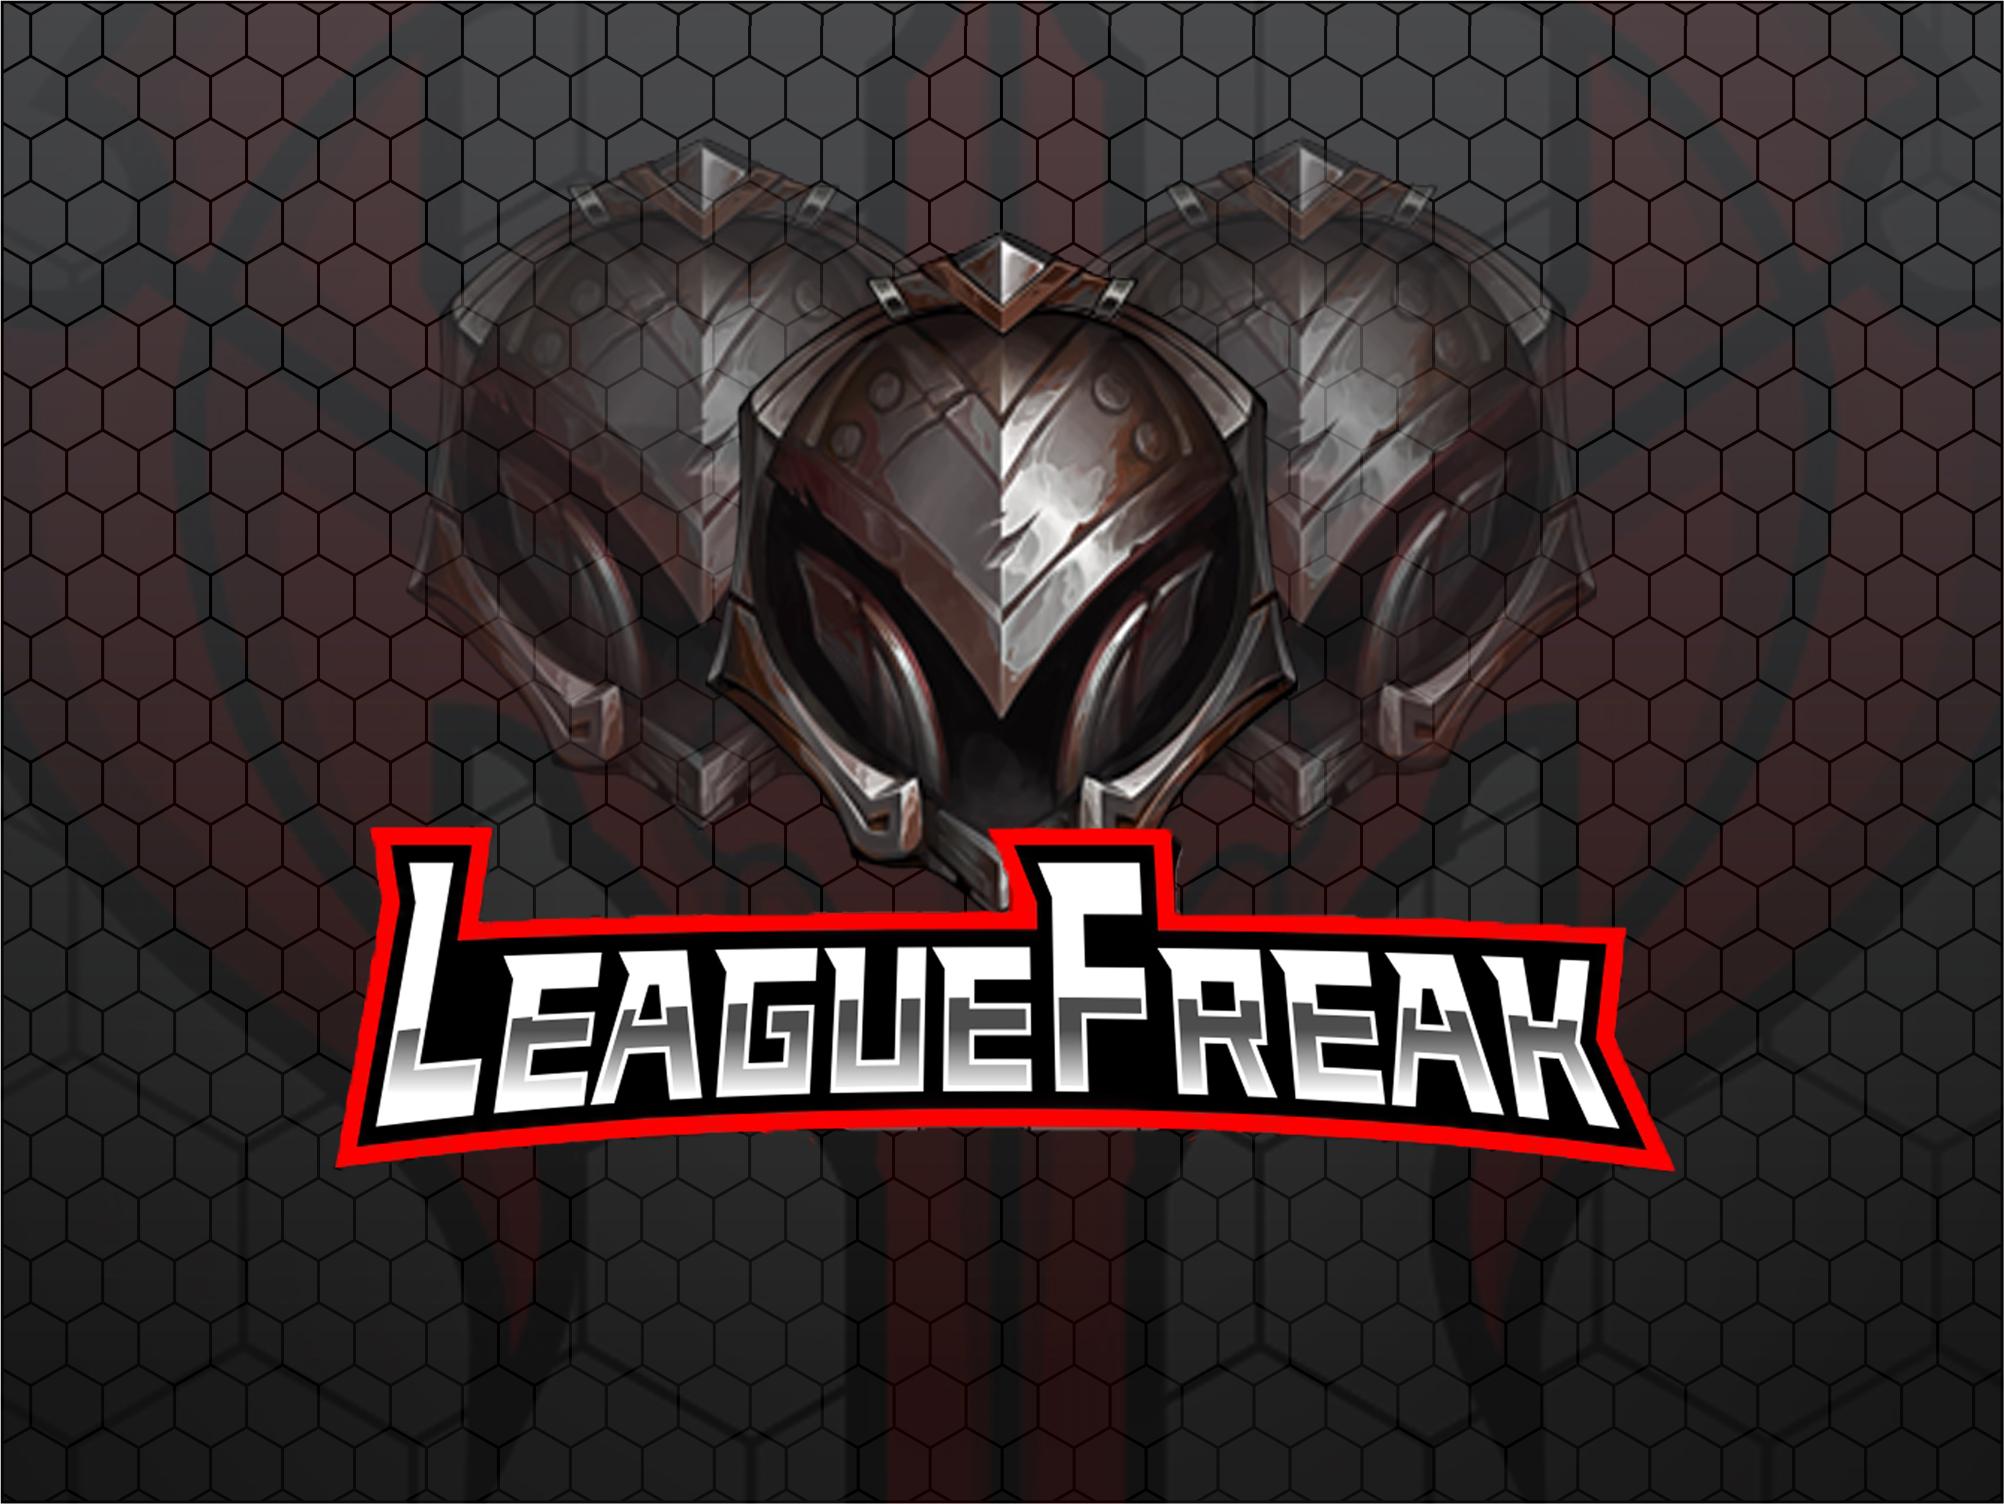 ELO BOOST IRON[EUW,EUNE,TR,RU SERVERS] LeagueFreak - e2p.com